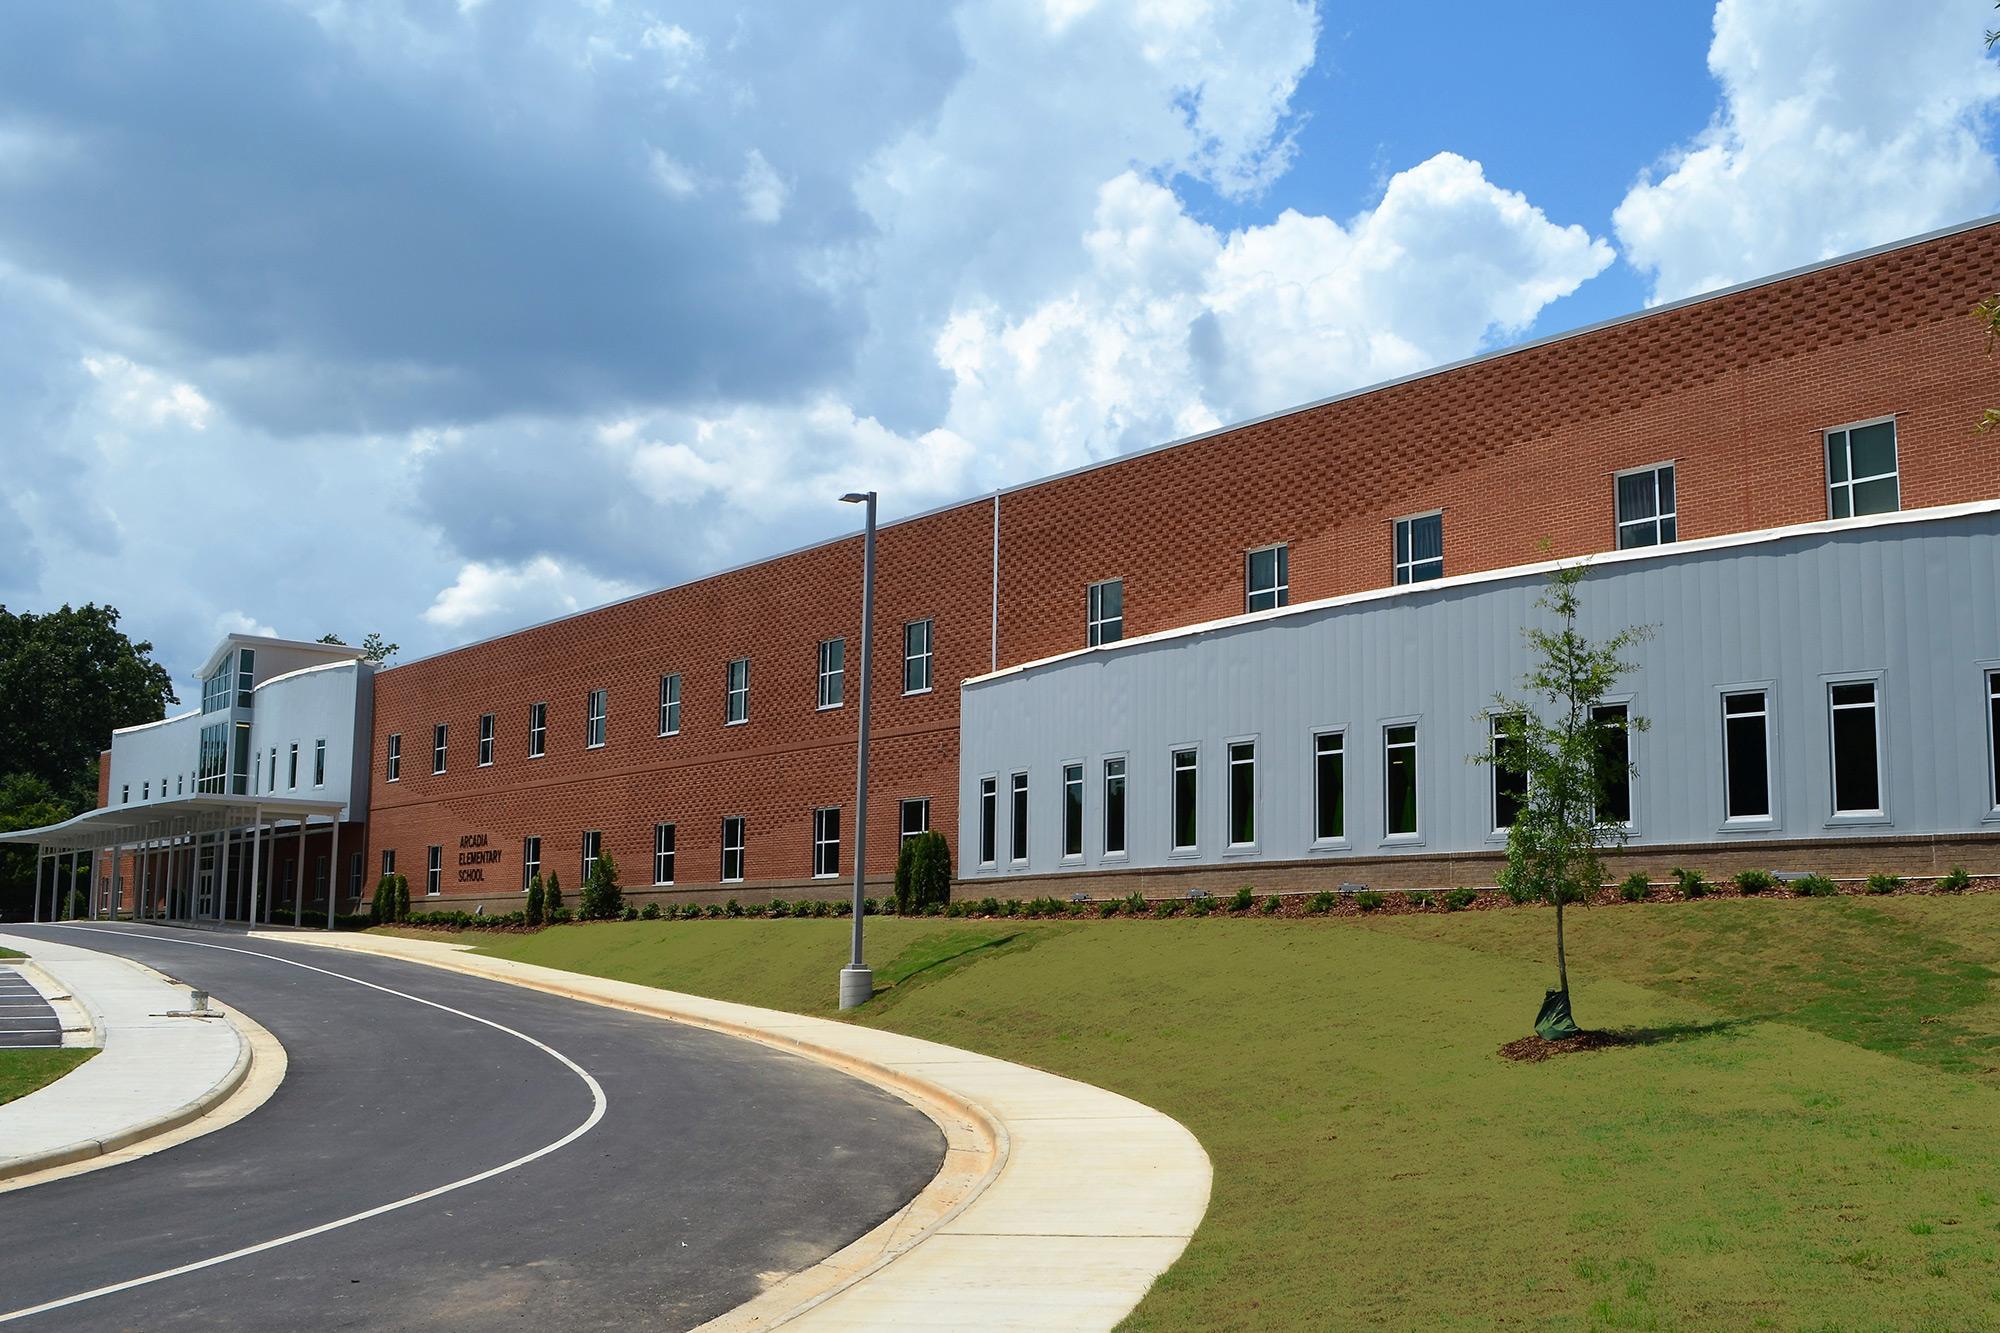 Arcadia Elementary School in Tuscaloosa Alabama